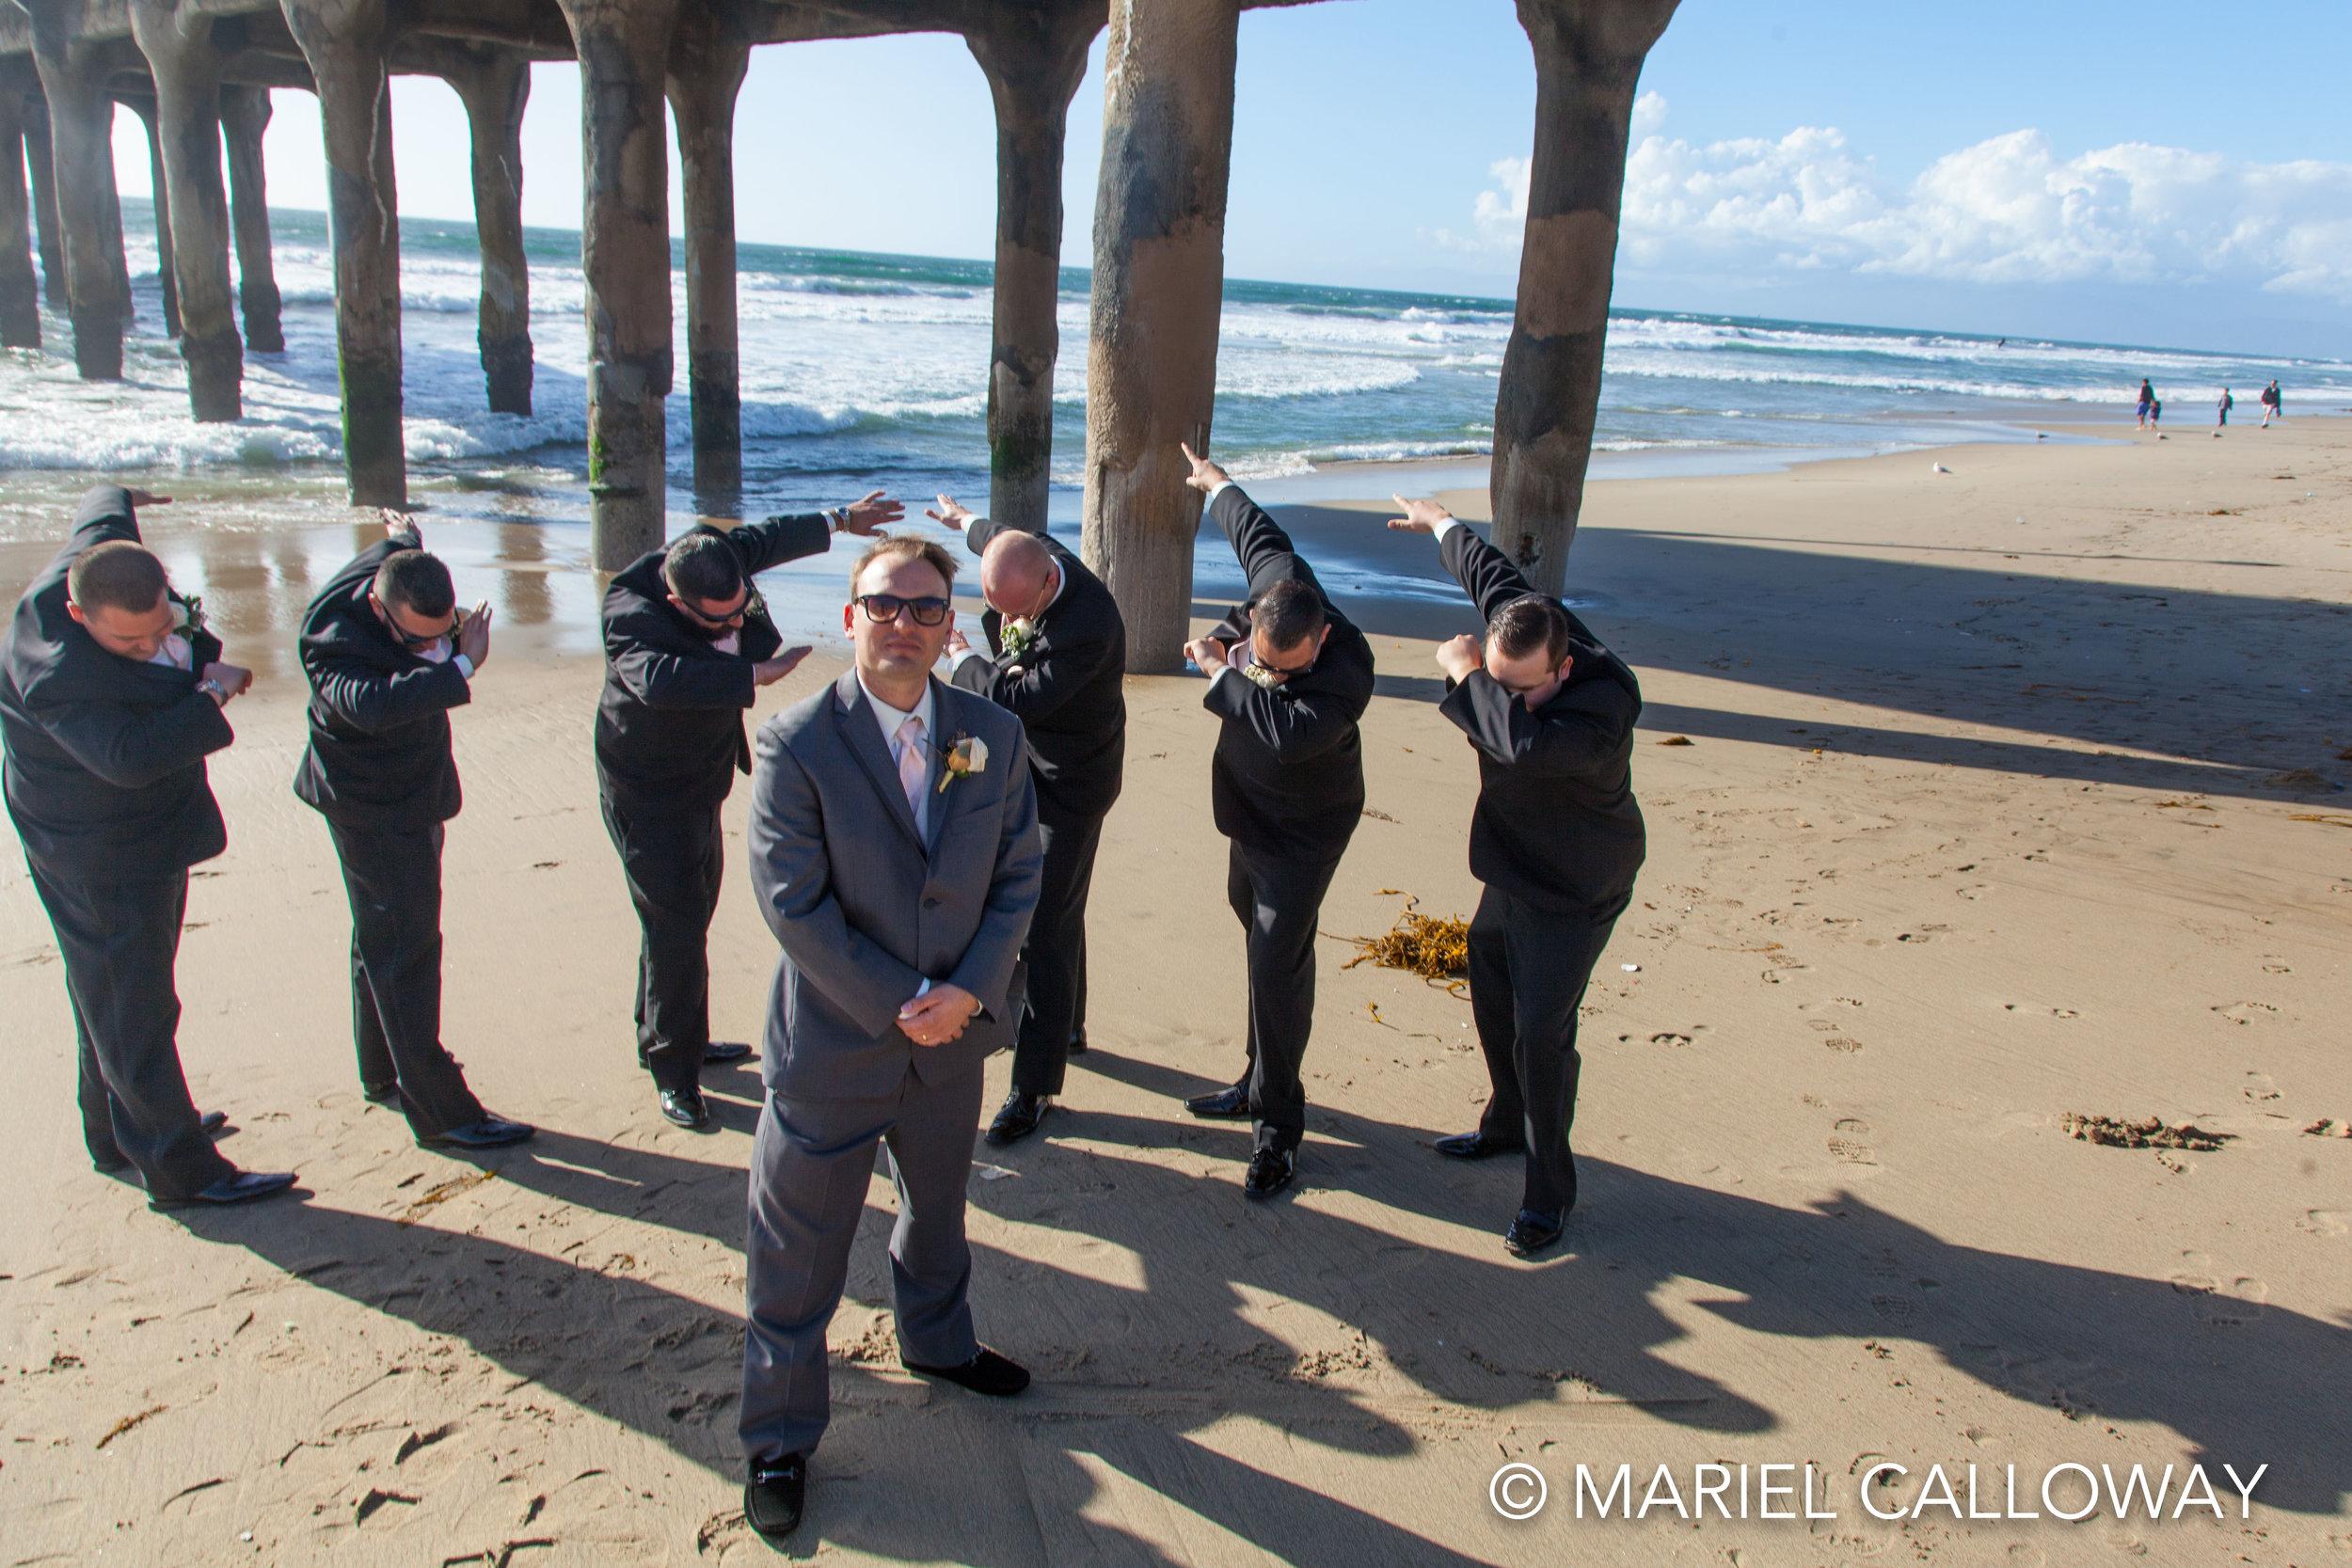 Mariel-Calloway-Los-Angeles-Wedding-Photography-Rossi-56.jpg